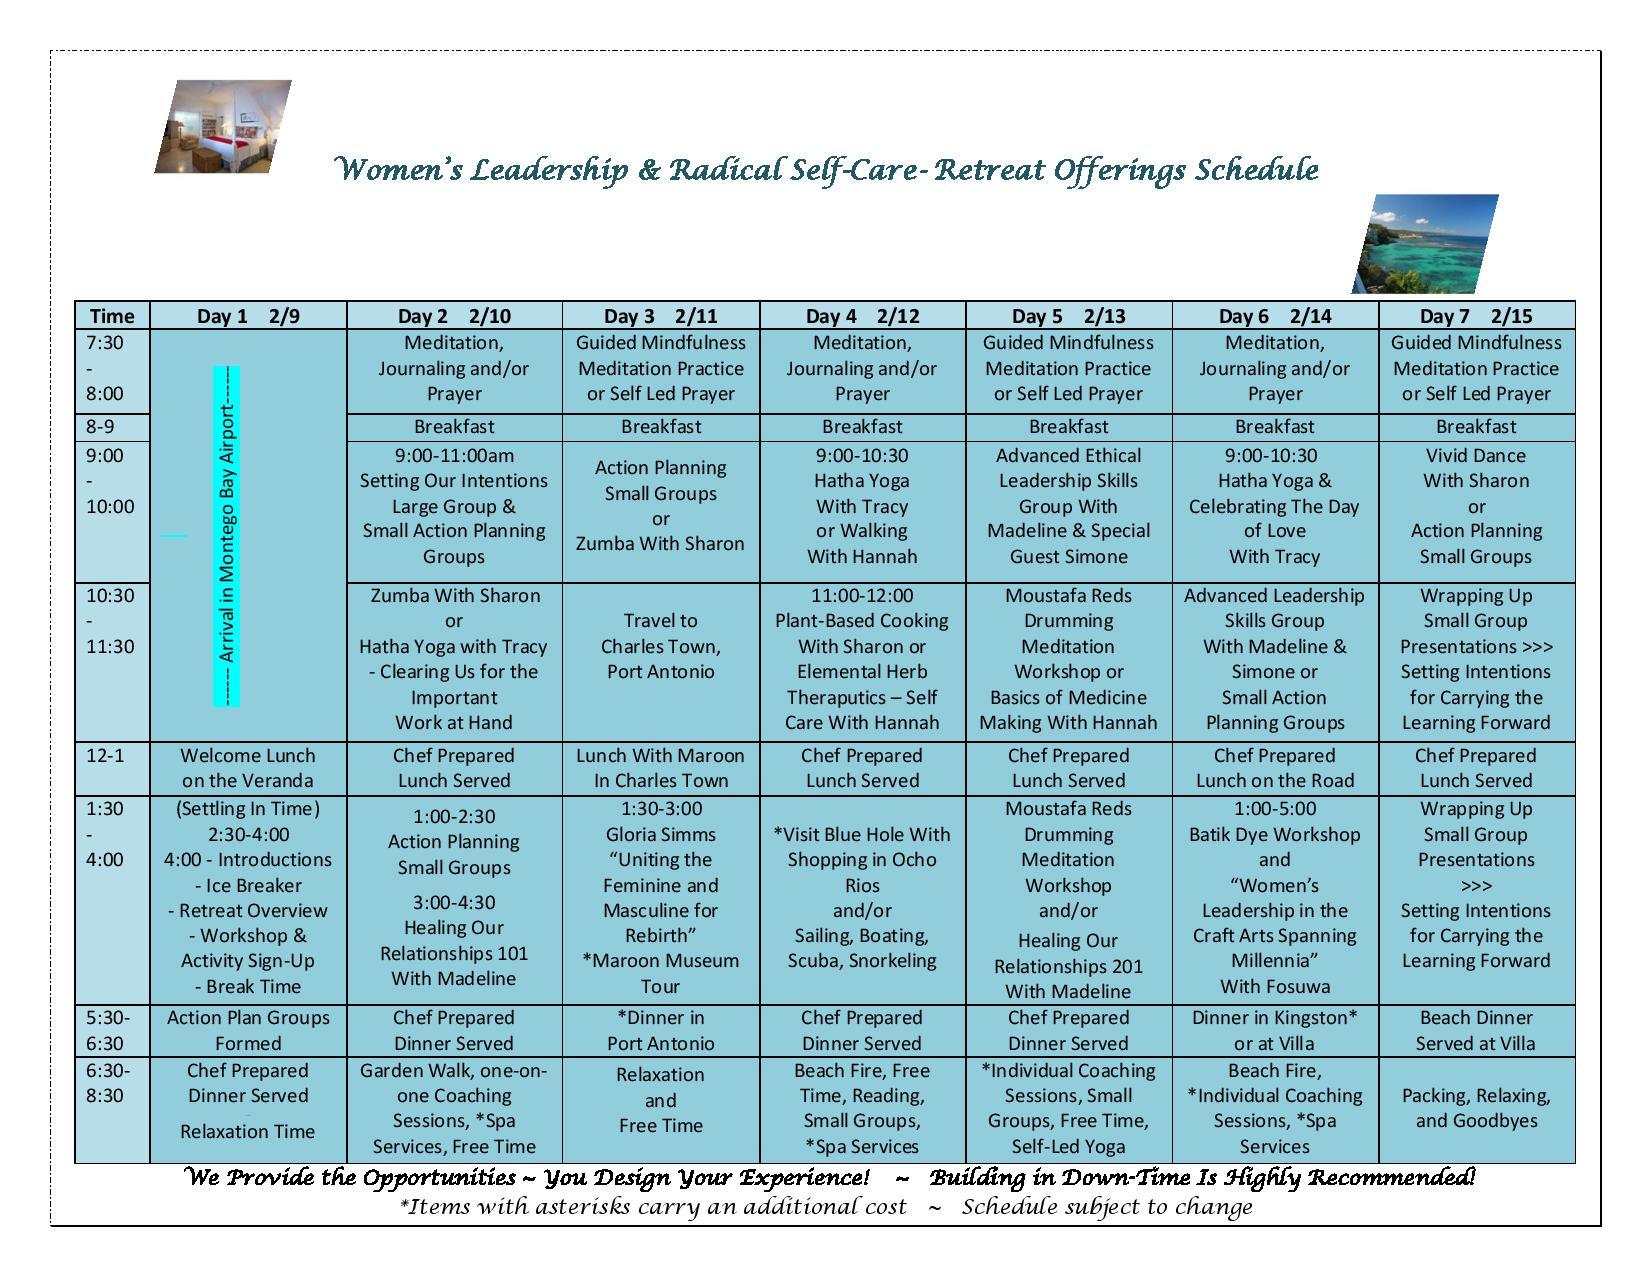 Workshop-Retreat Schedule of Eventsjpg.jpg